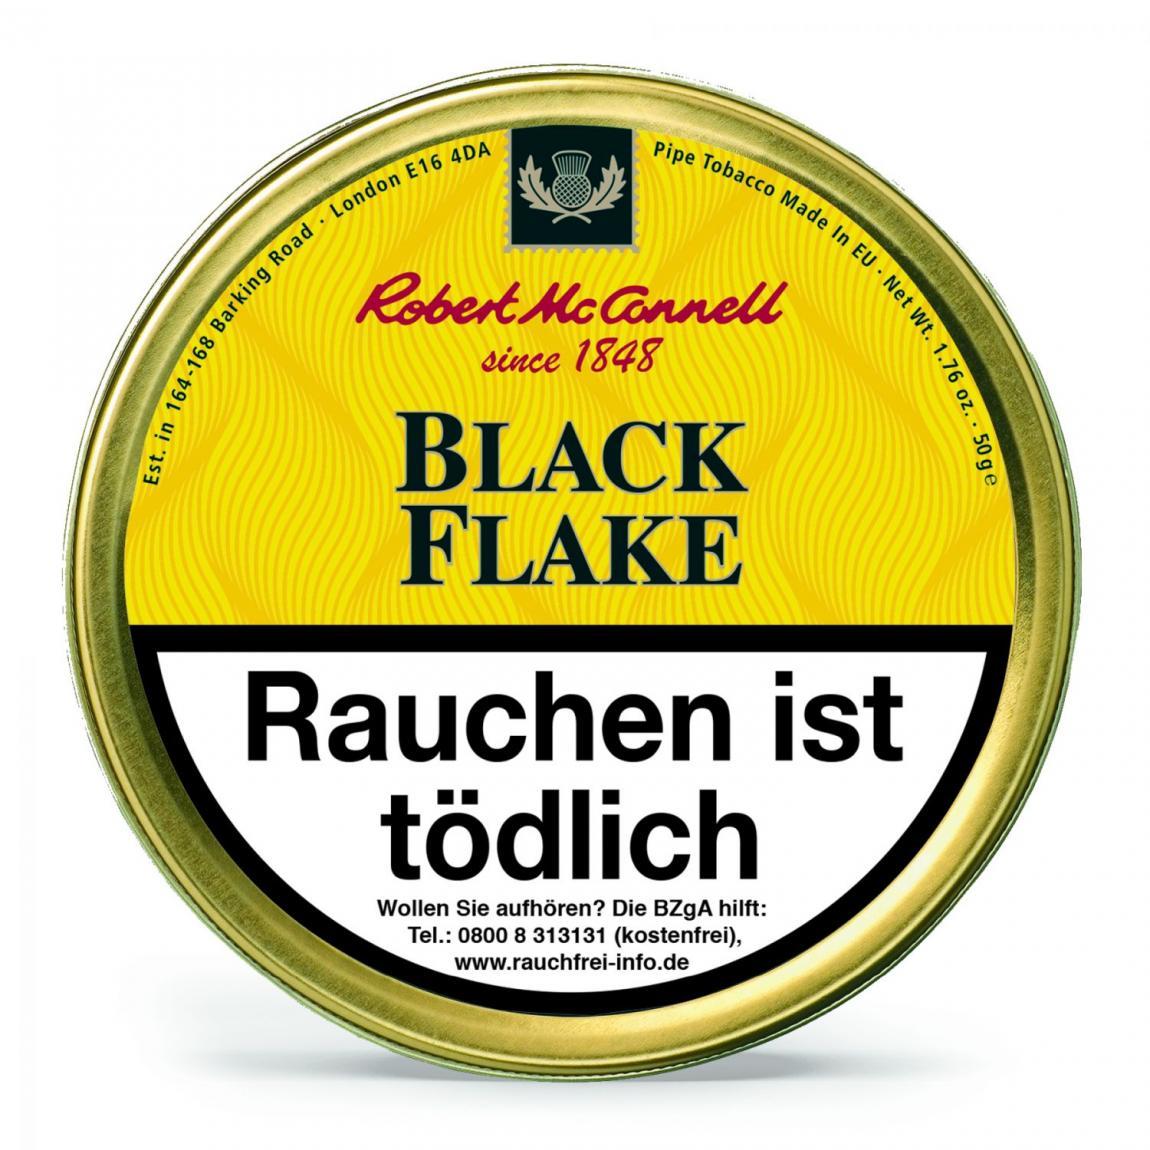 Robert McConnell Heritage »Black Flake« 50g